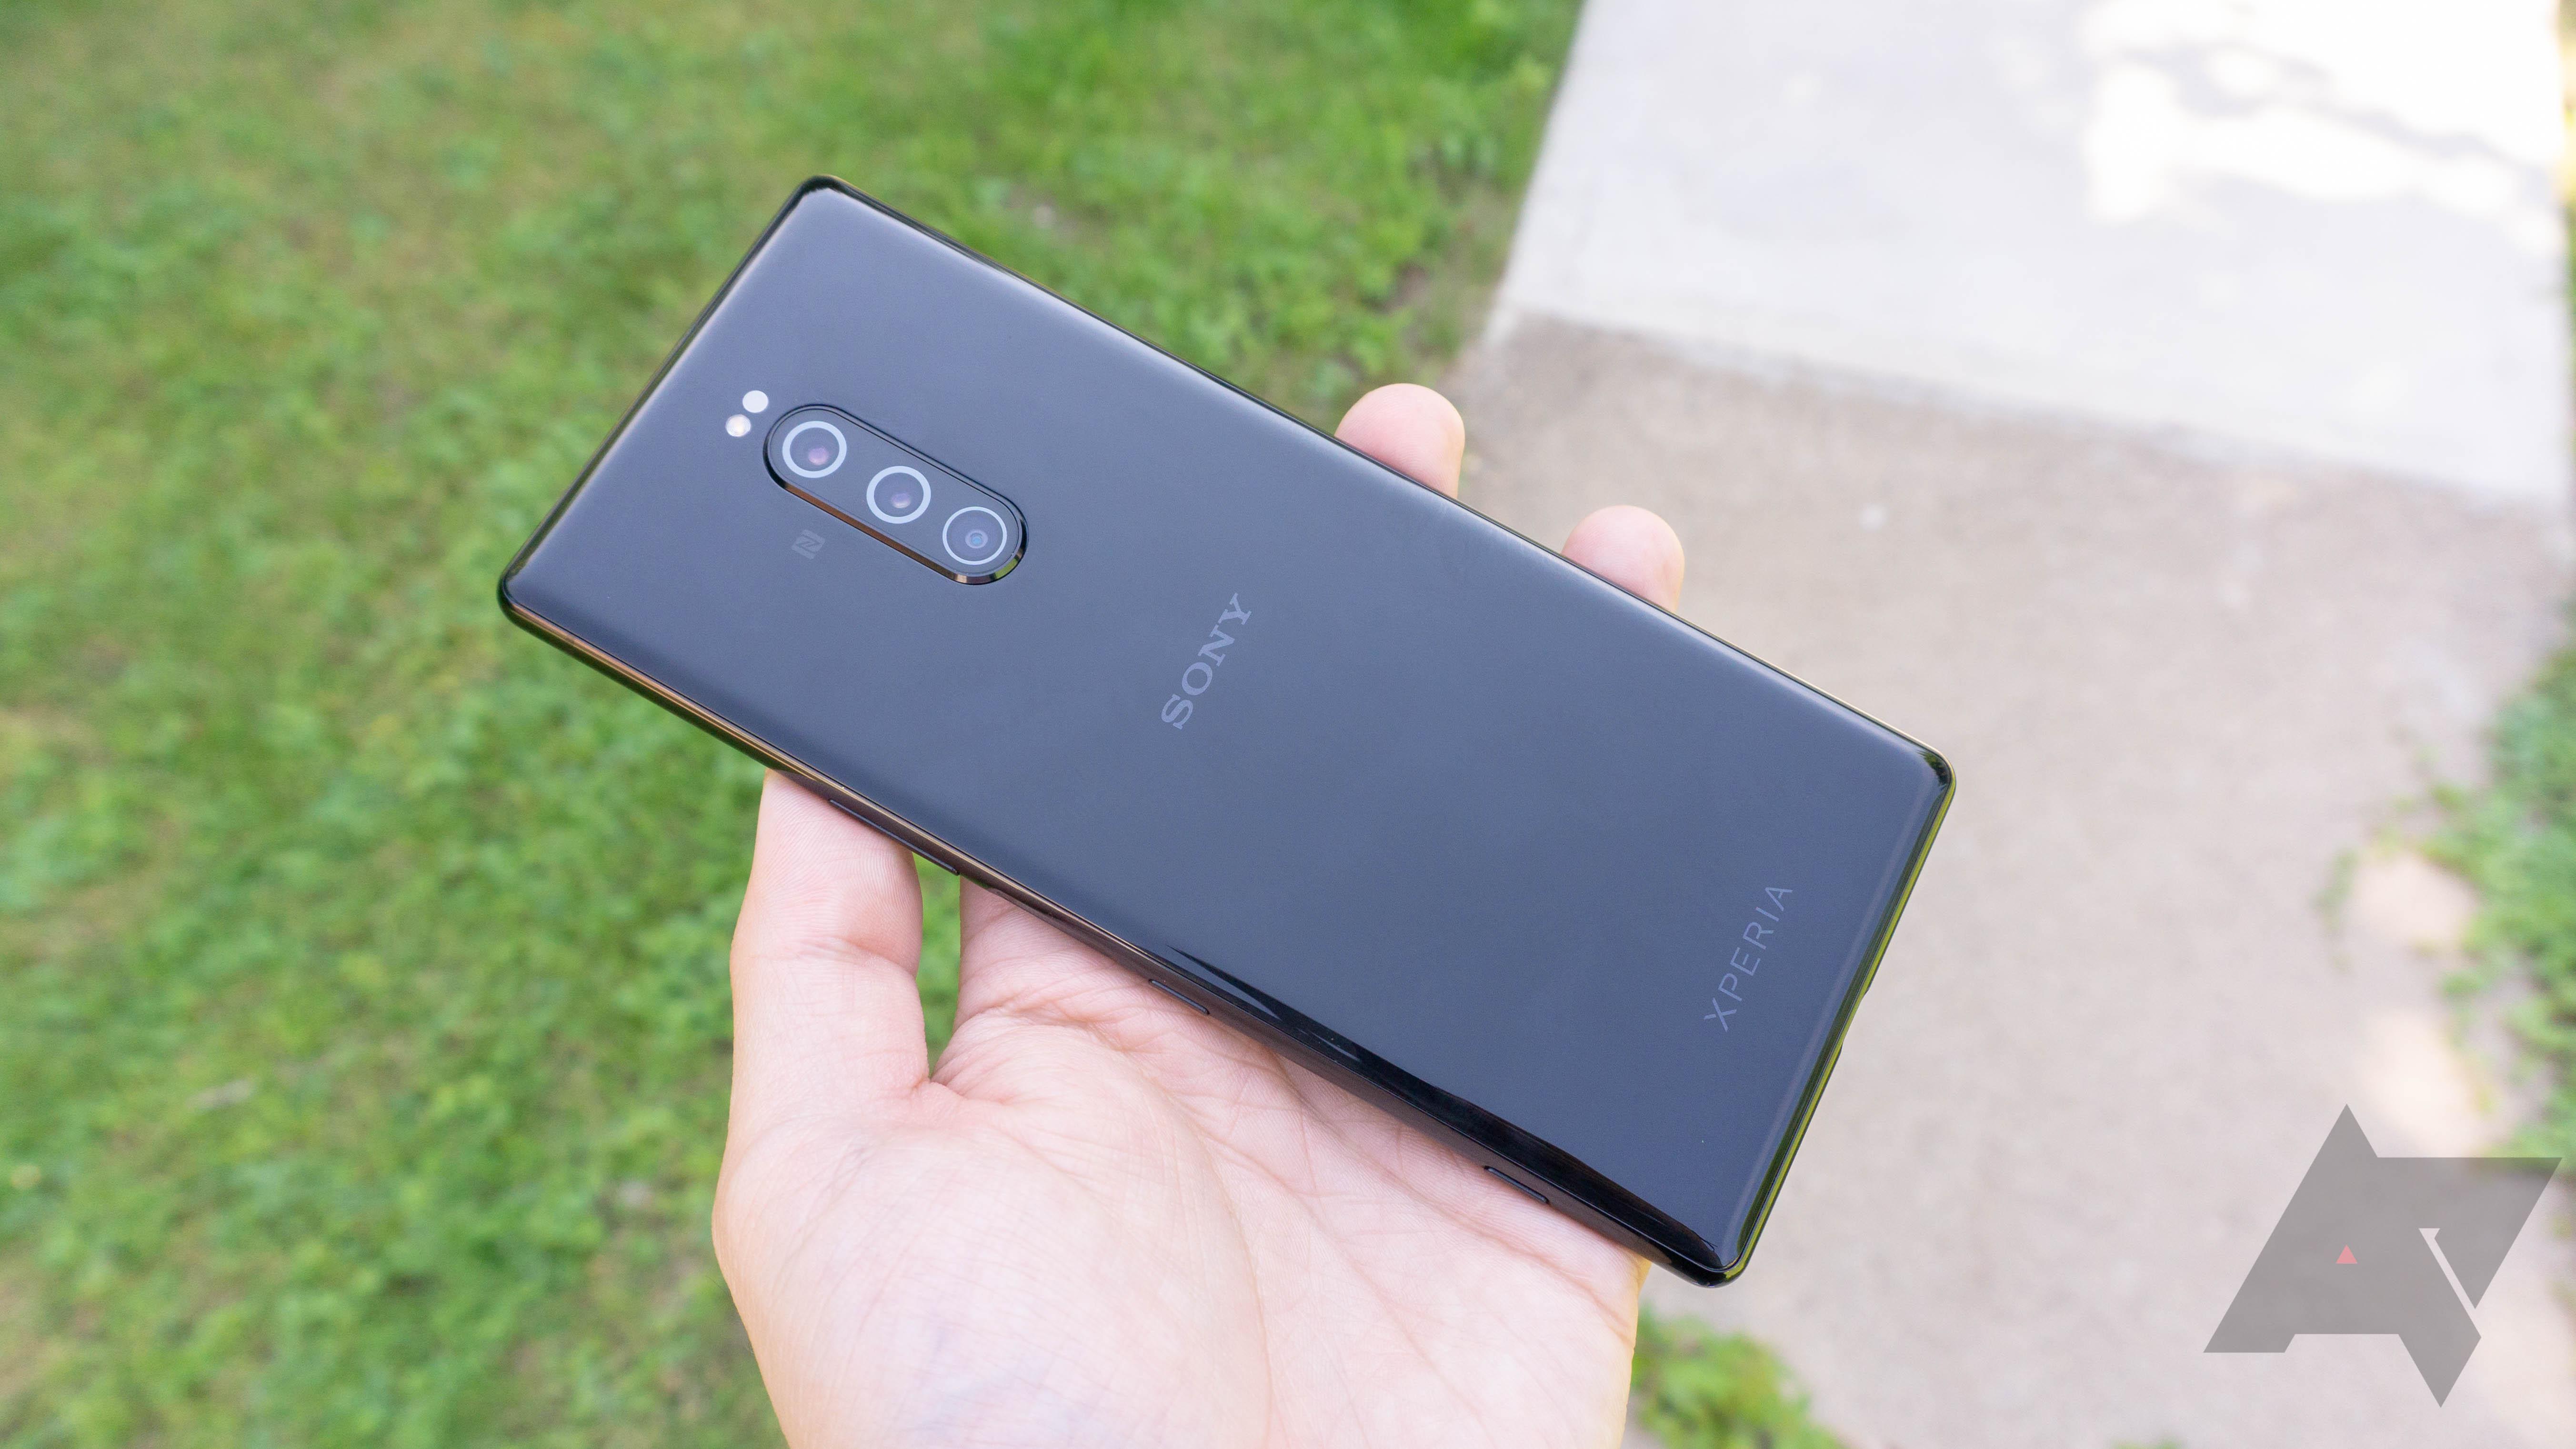 Xperia Launcher 2019